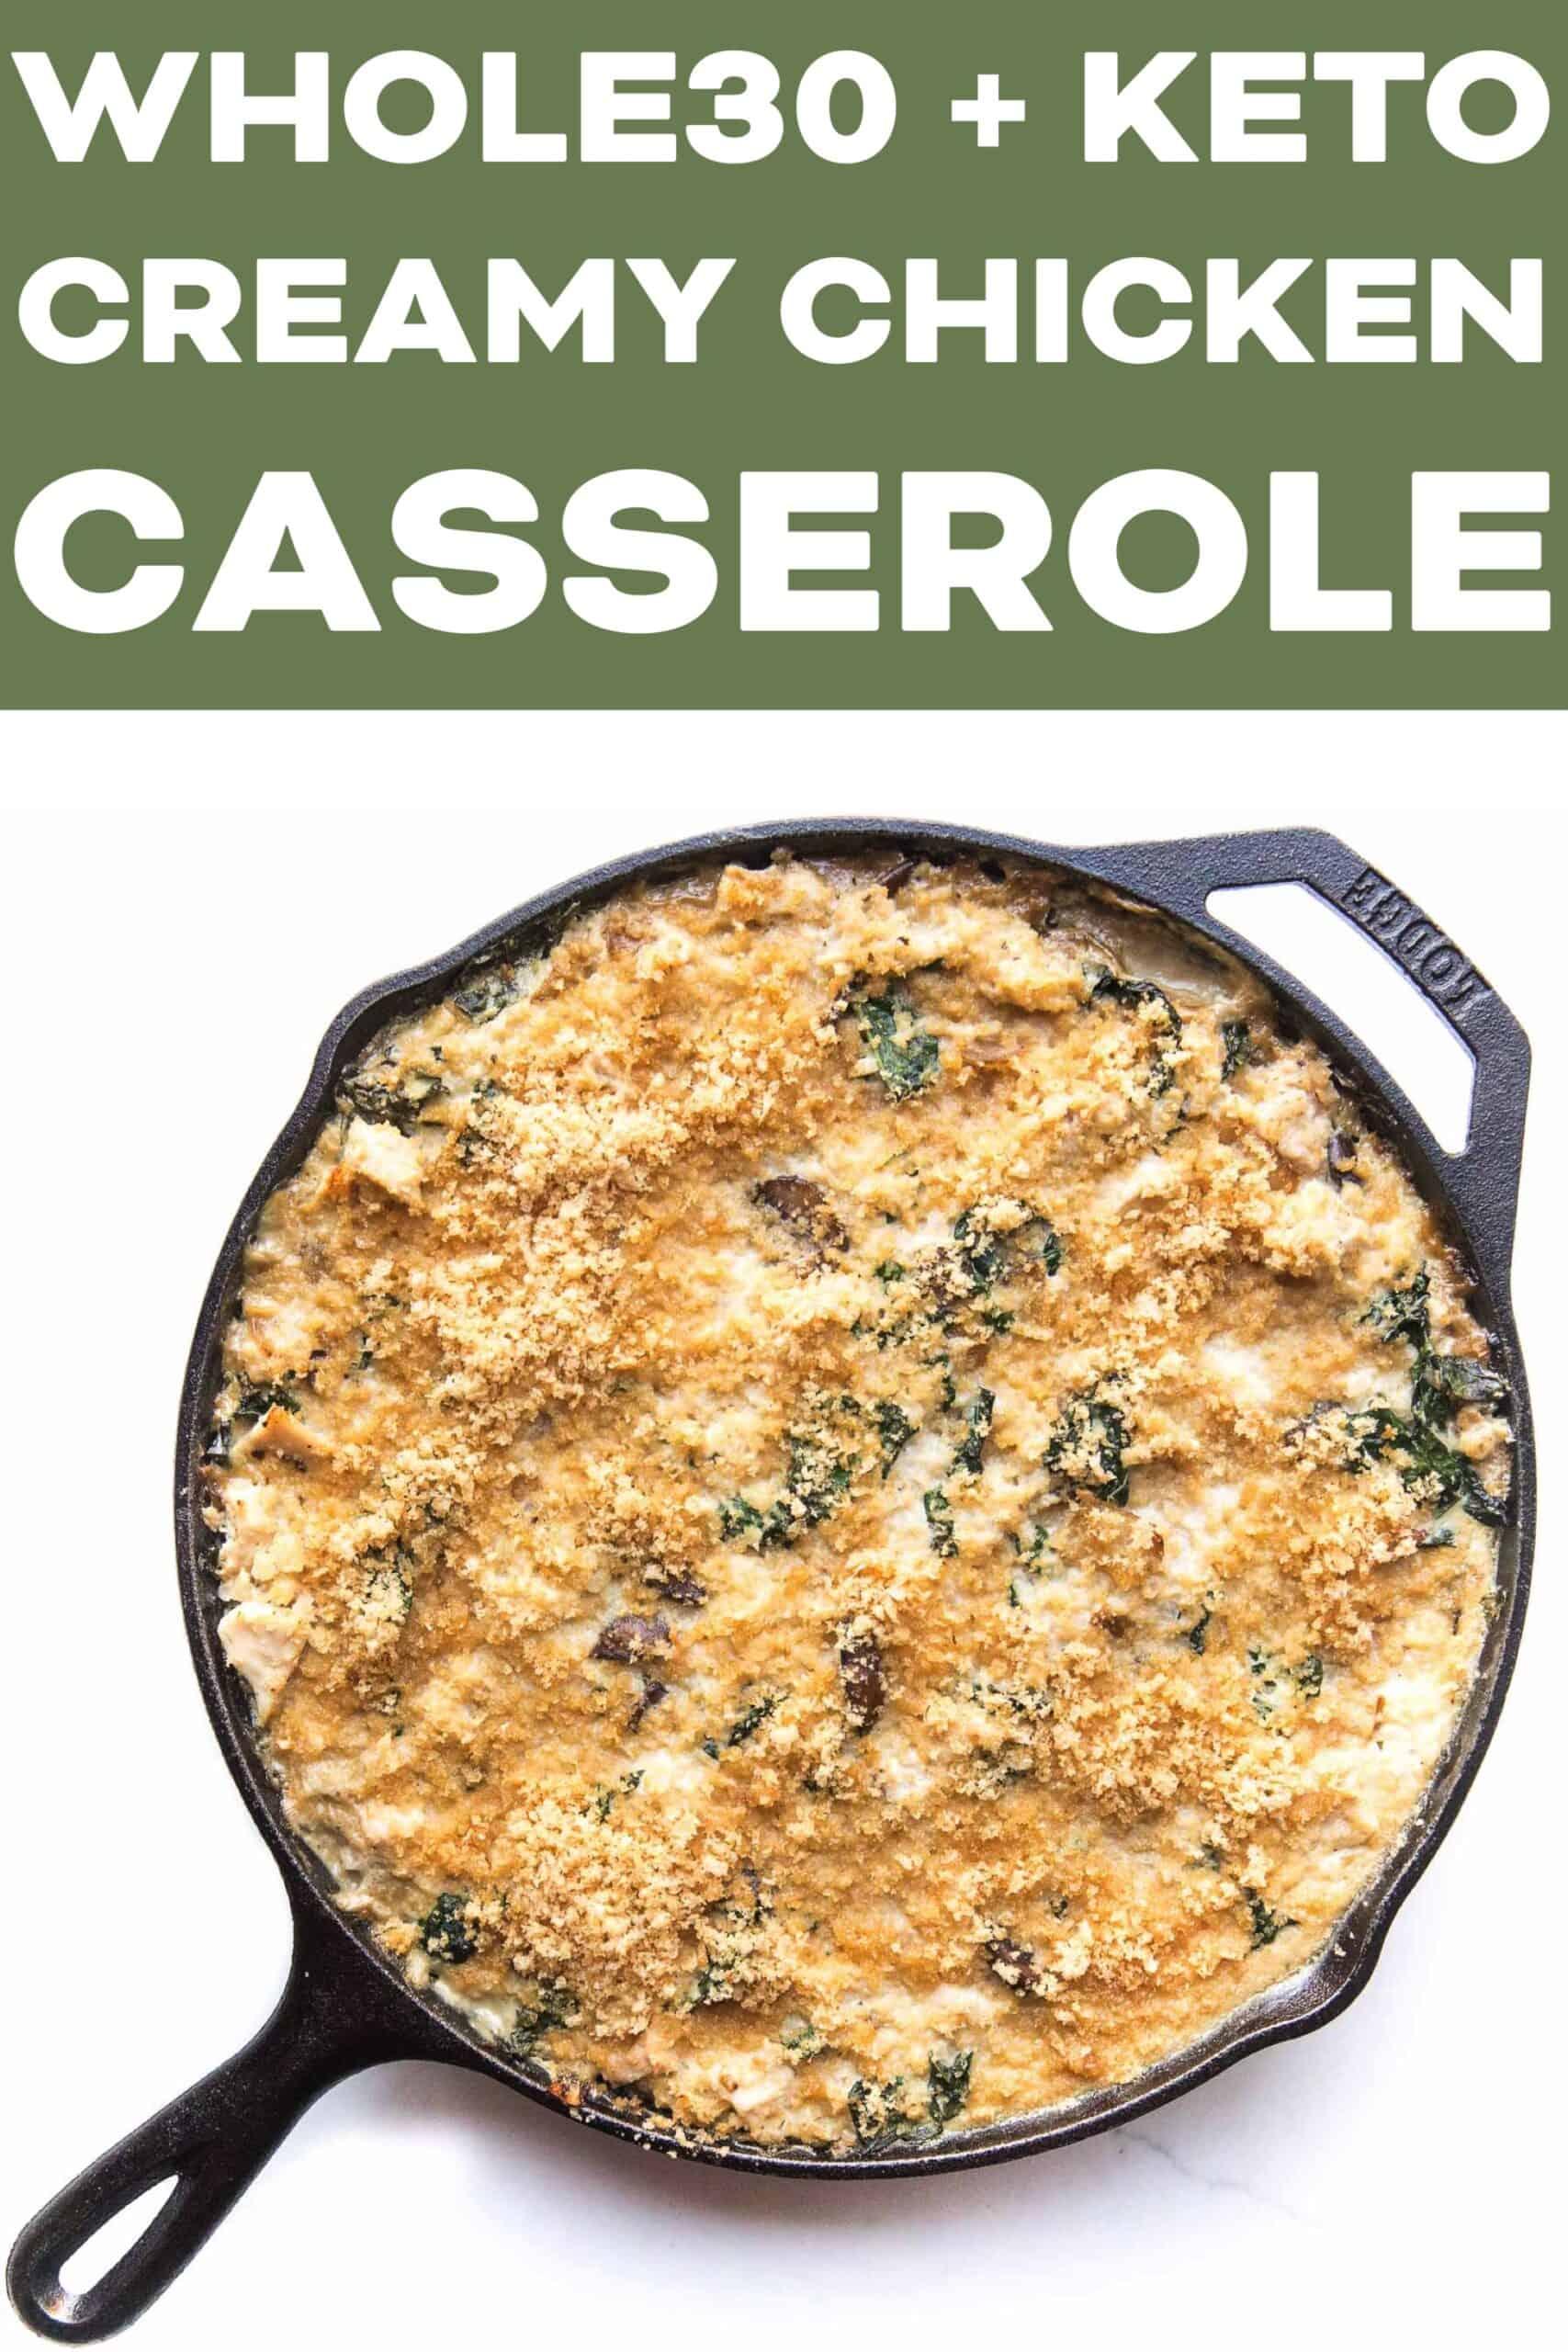 Whole30 Keto Creamy Chicken Cauliflower Rice Casserole